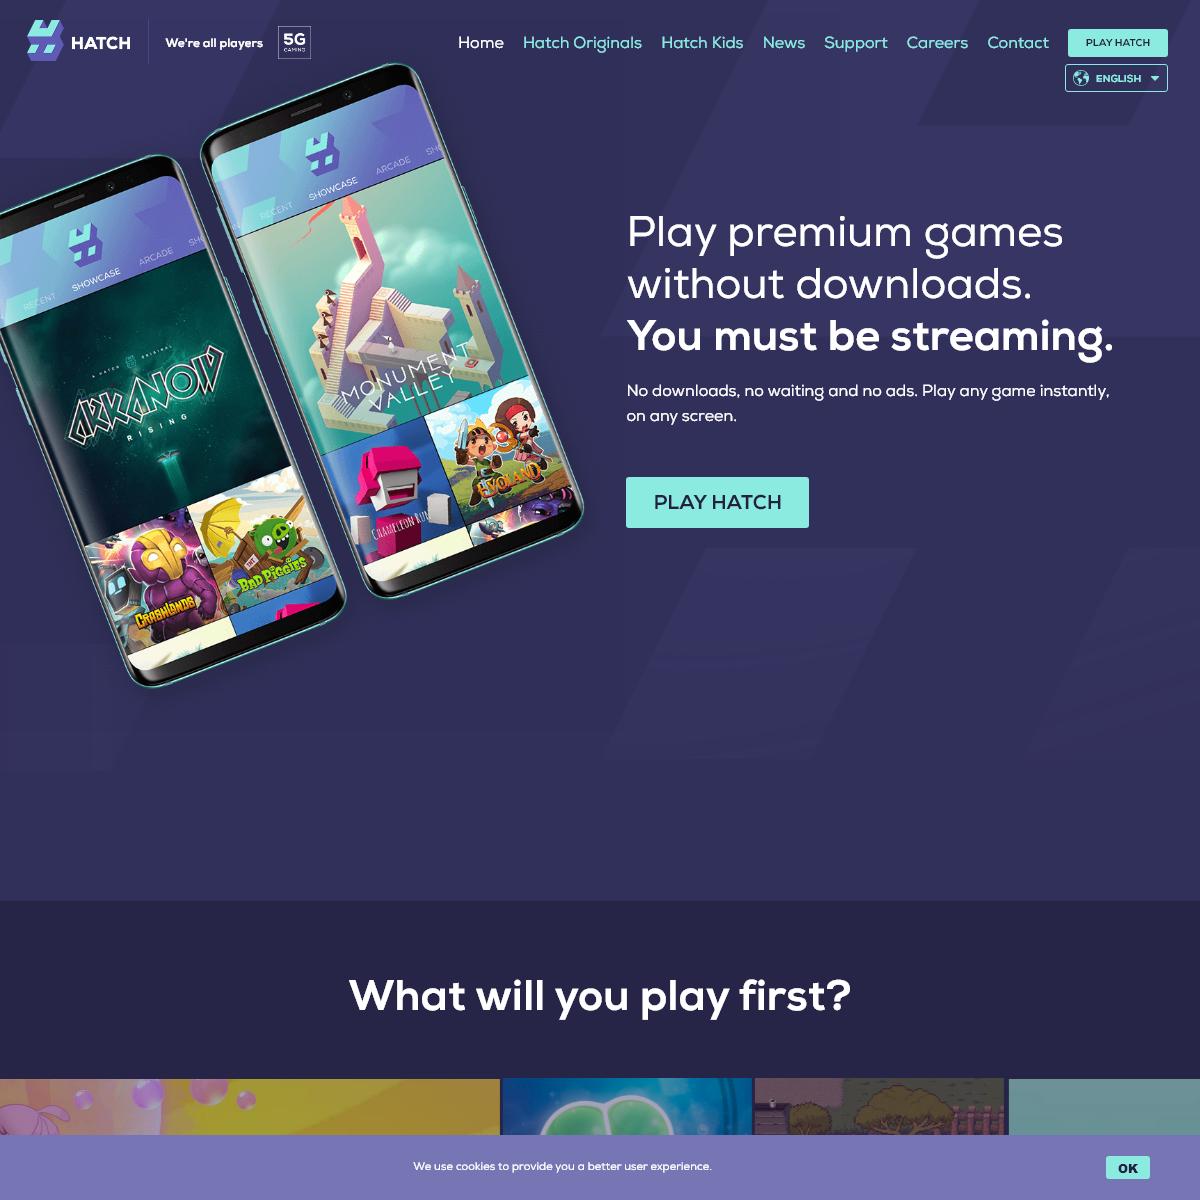 Hatch - Stream premium mobile games - No downloads required